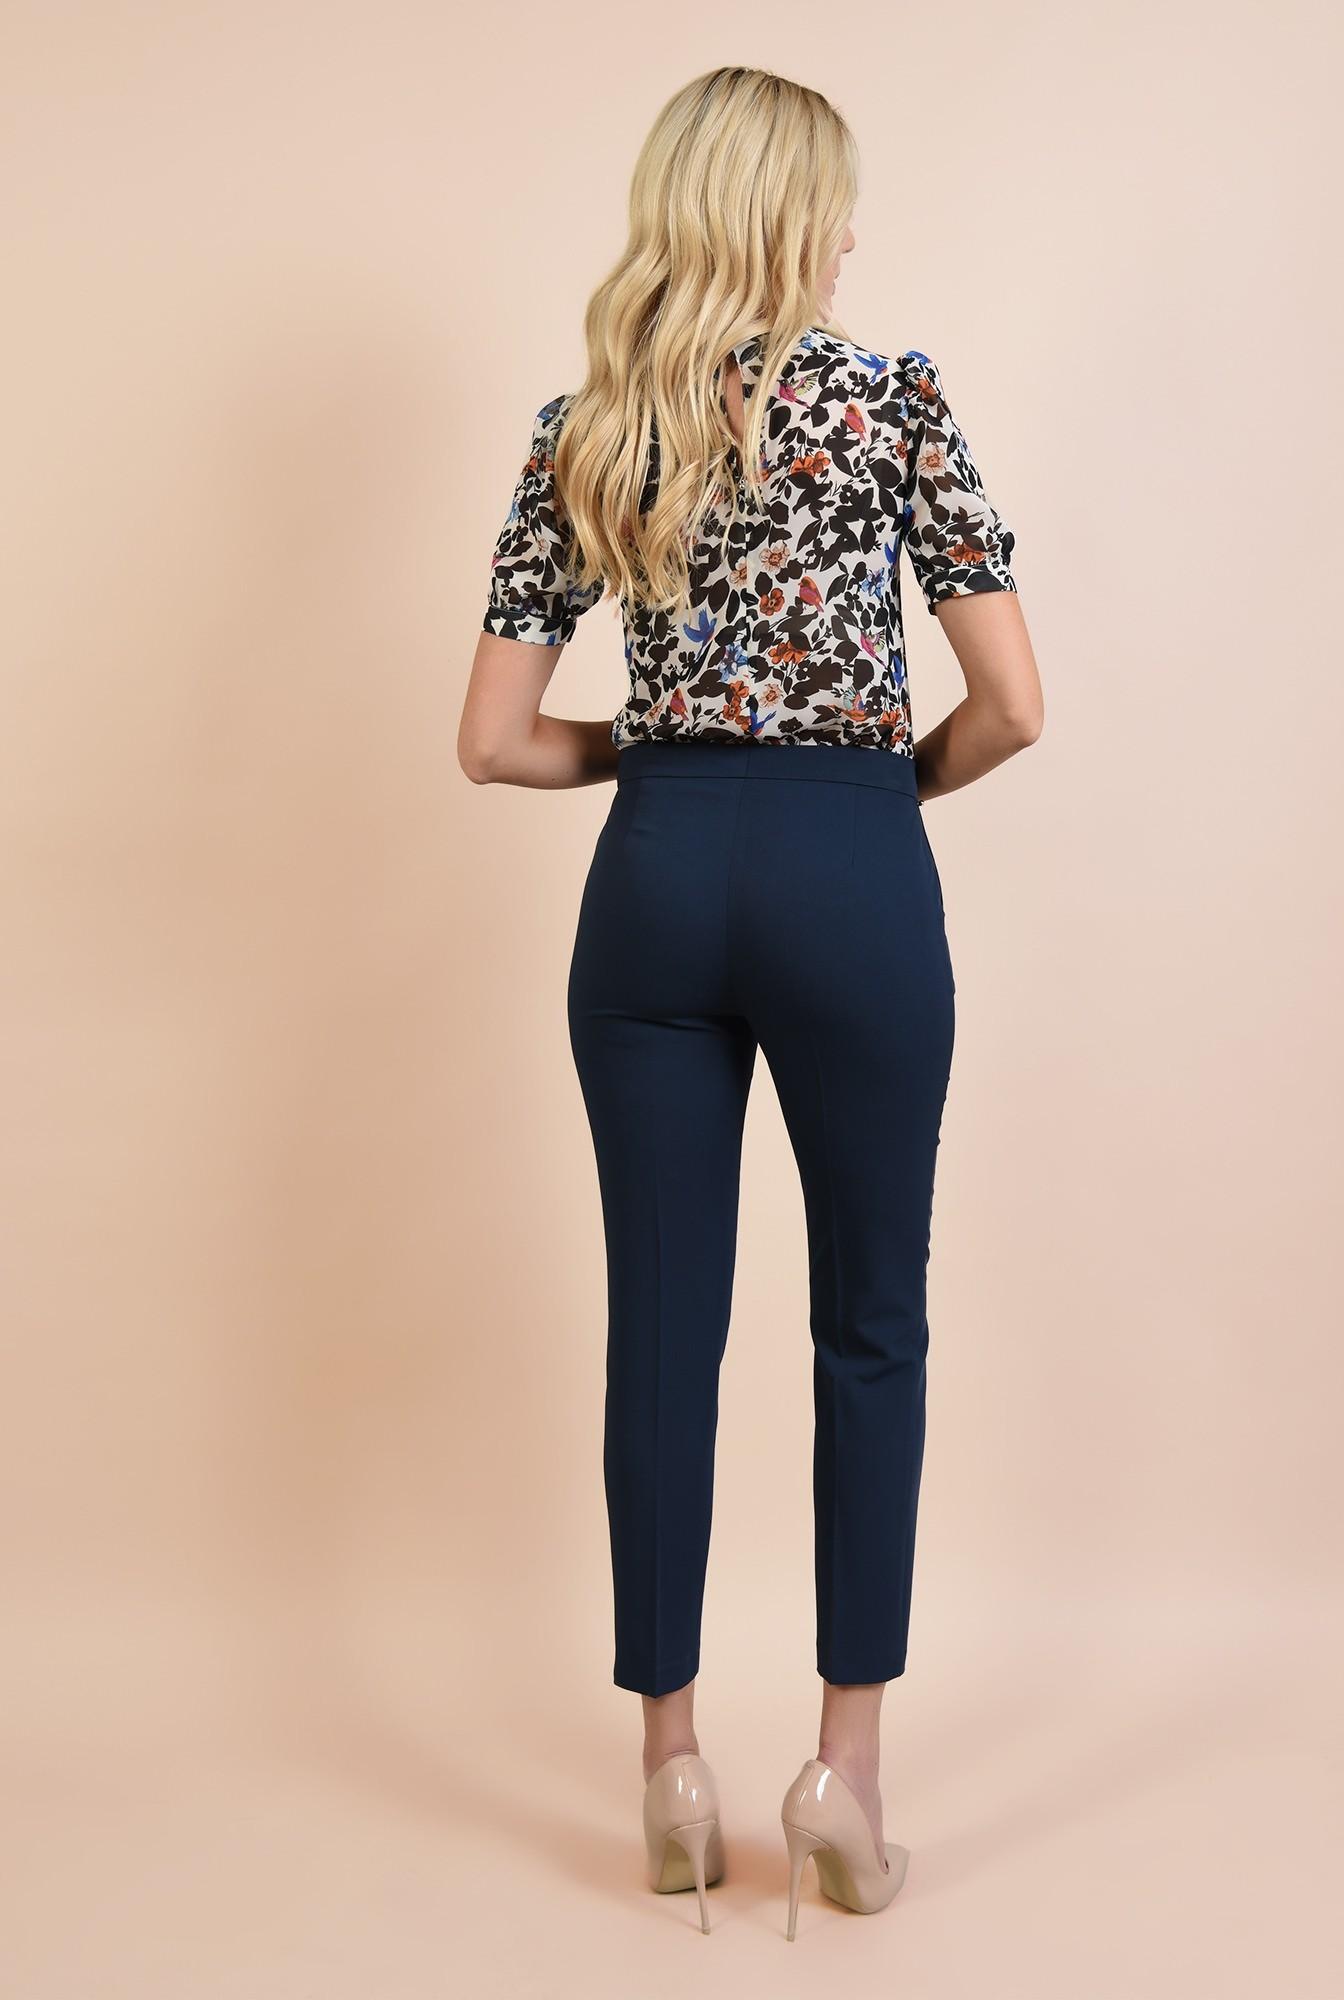 1 - 360 - pantaloni bleumarin, tigareta, cu buzunare, croi conic la dunga